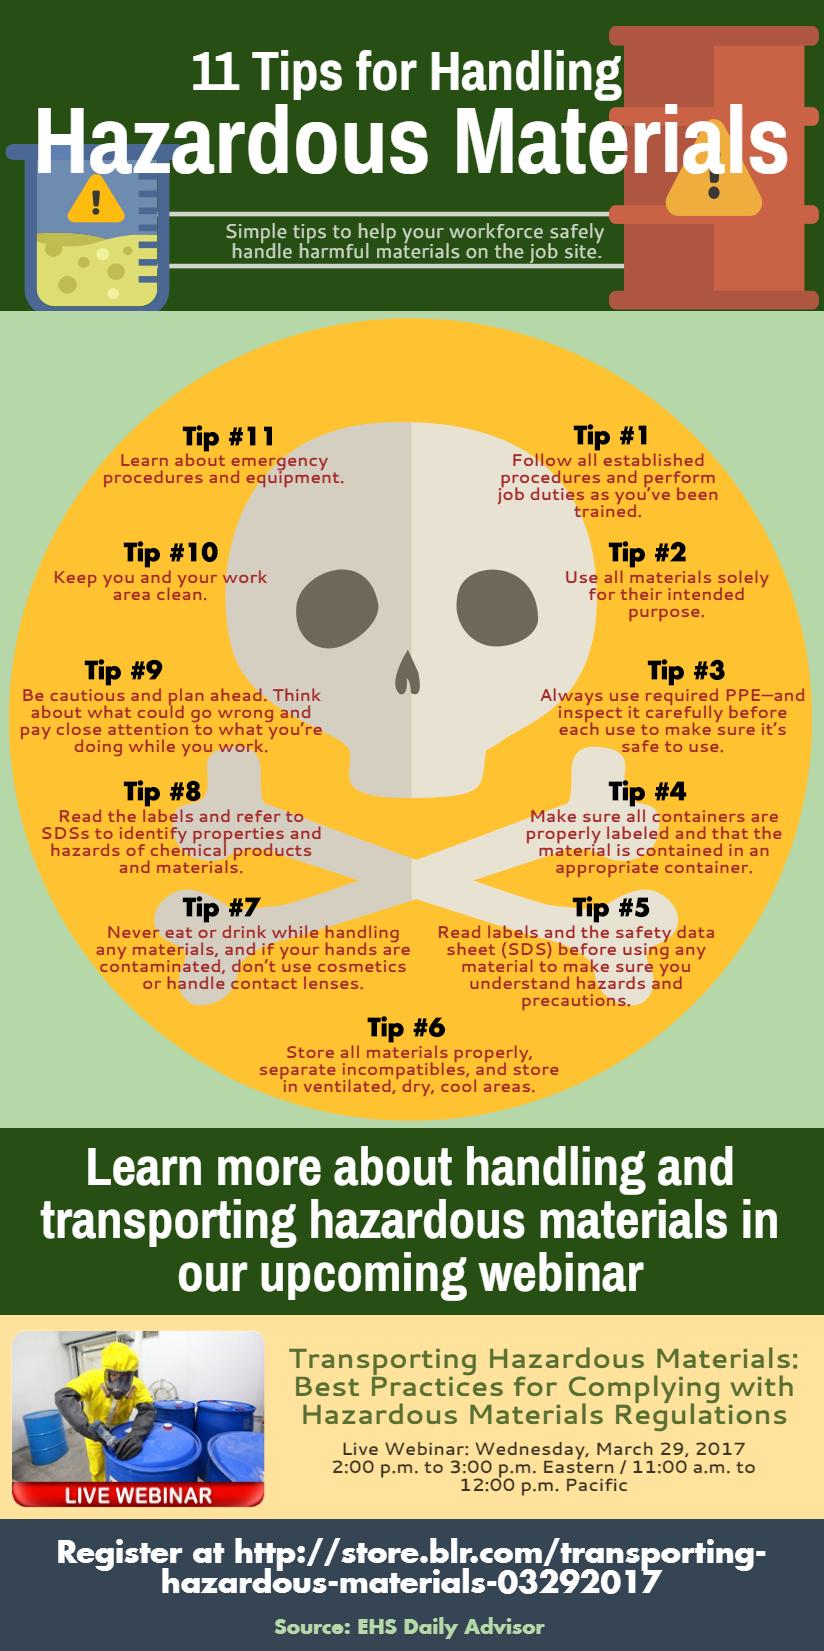 11 Tips for Handling Hazardous Materials #infographic #Hazardous Materials #infographics #Hazardous #Safe Handling